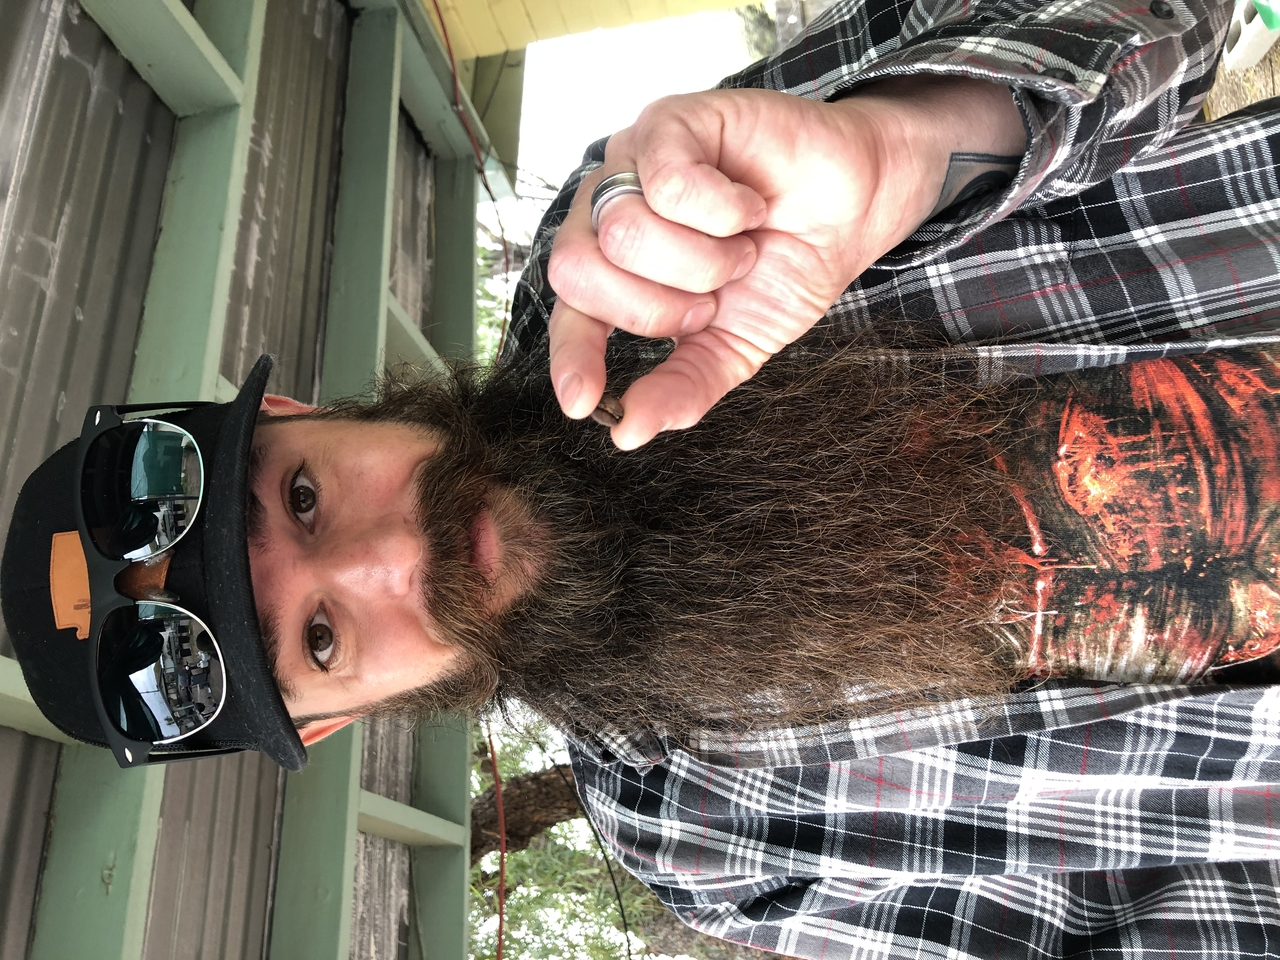 Matt DeVore, holding a single coffee bean